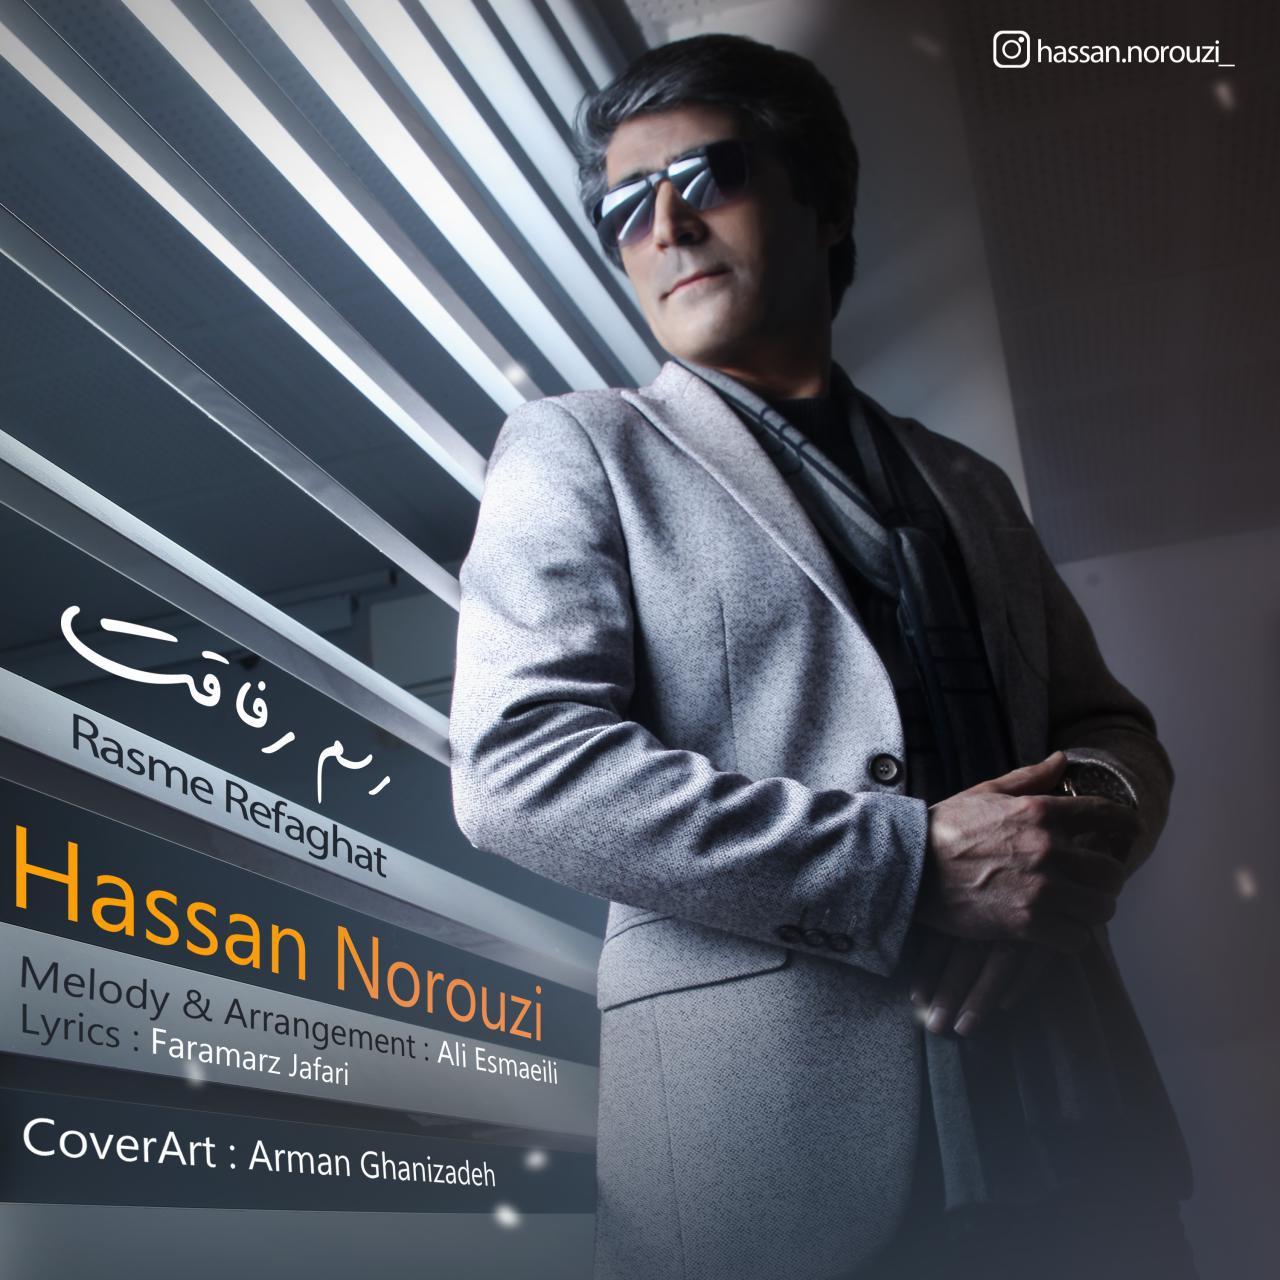 Hassan Norouzi – Rasme Refaghat